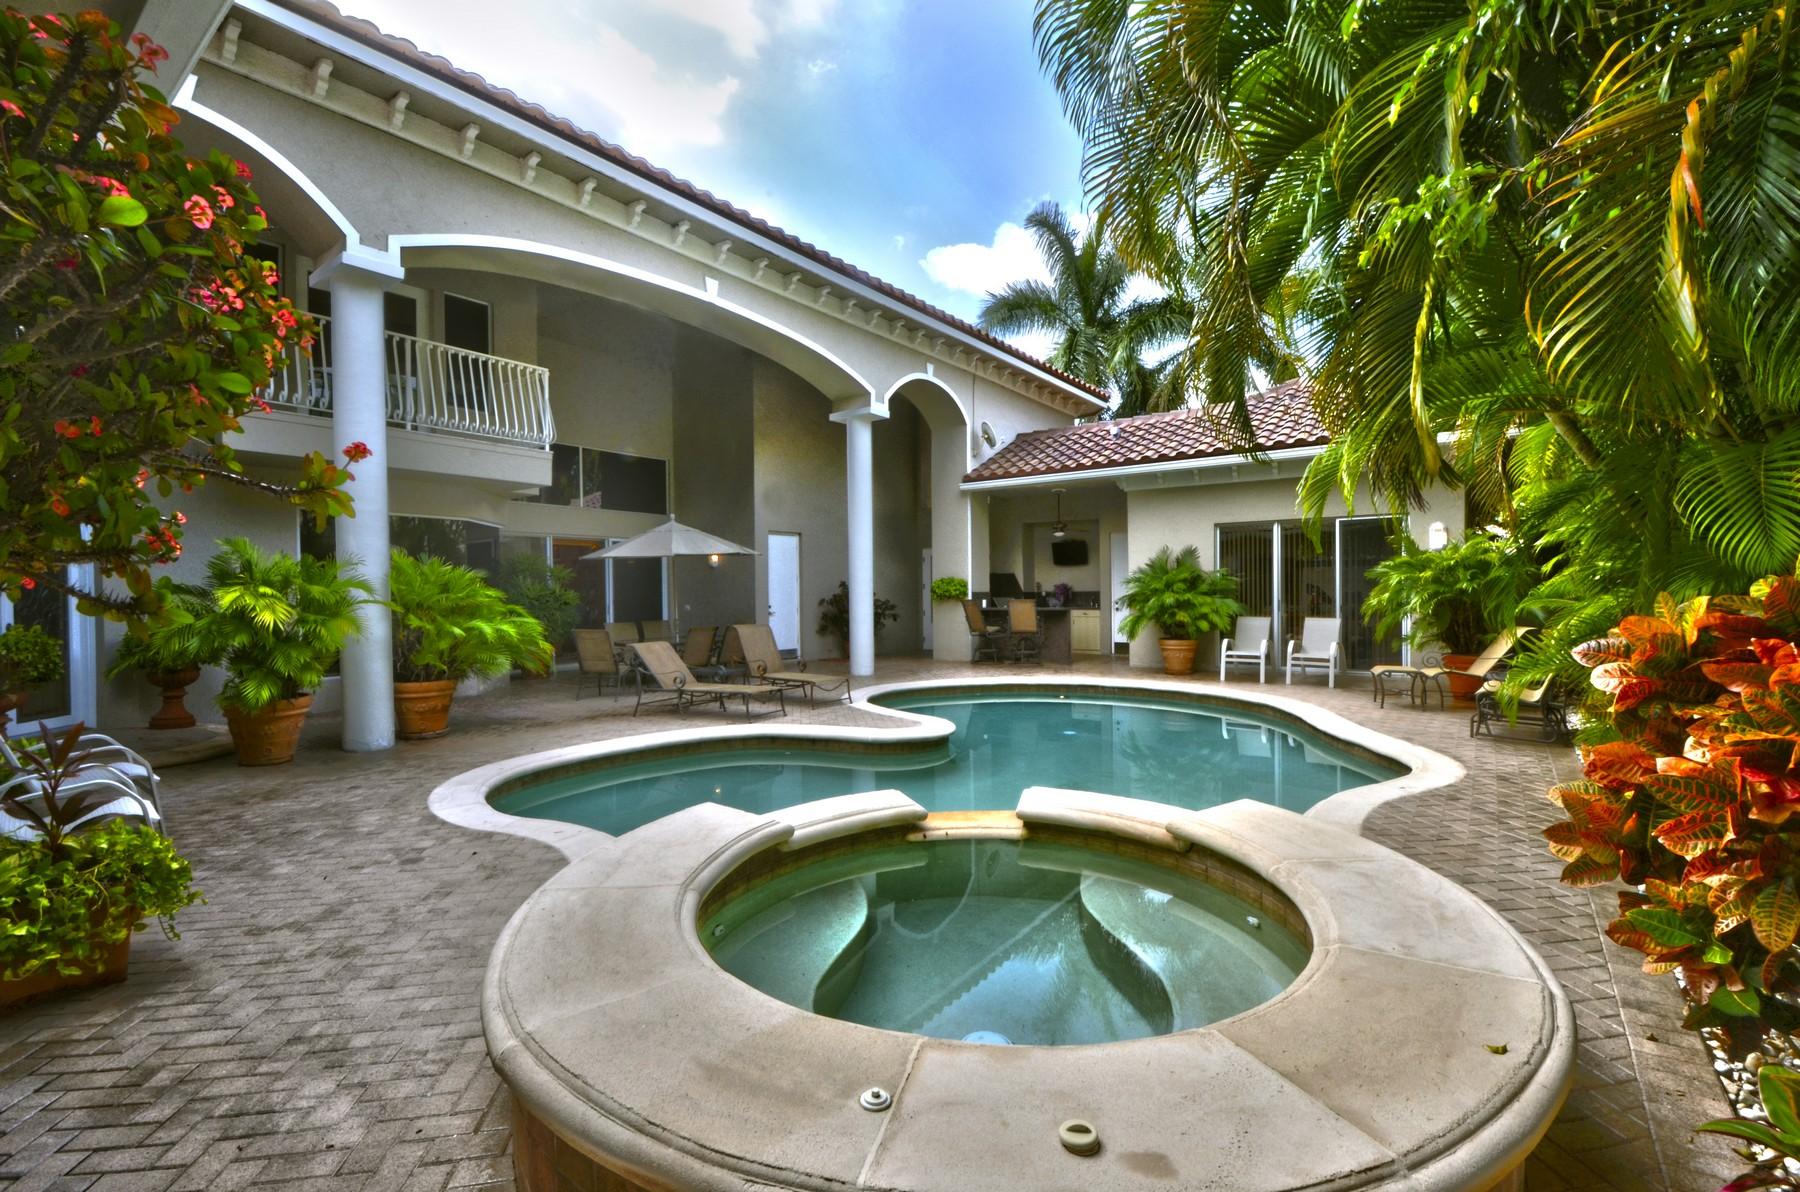 Casa Unifamiliar por un Venta en 3221 NW 61st St , Boca Raton, FL 33496 Boca Raton, Florida 33496 Estados Unidos